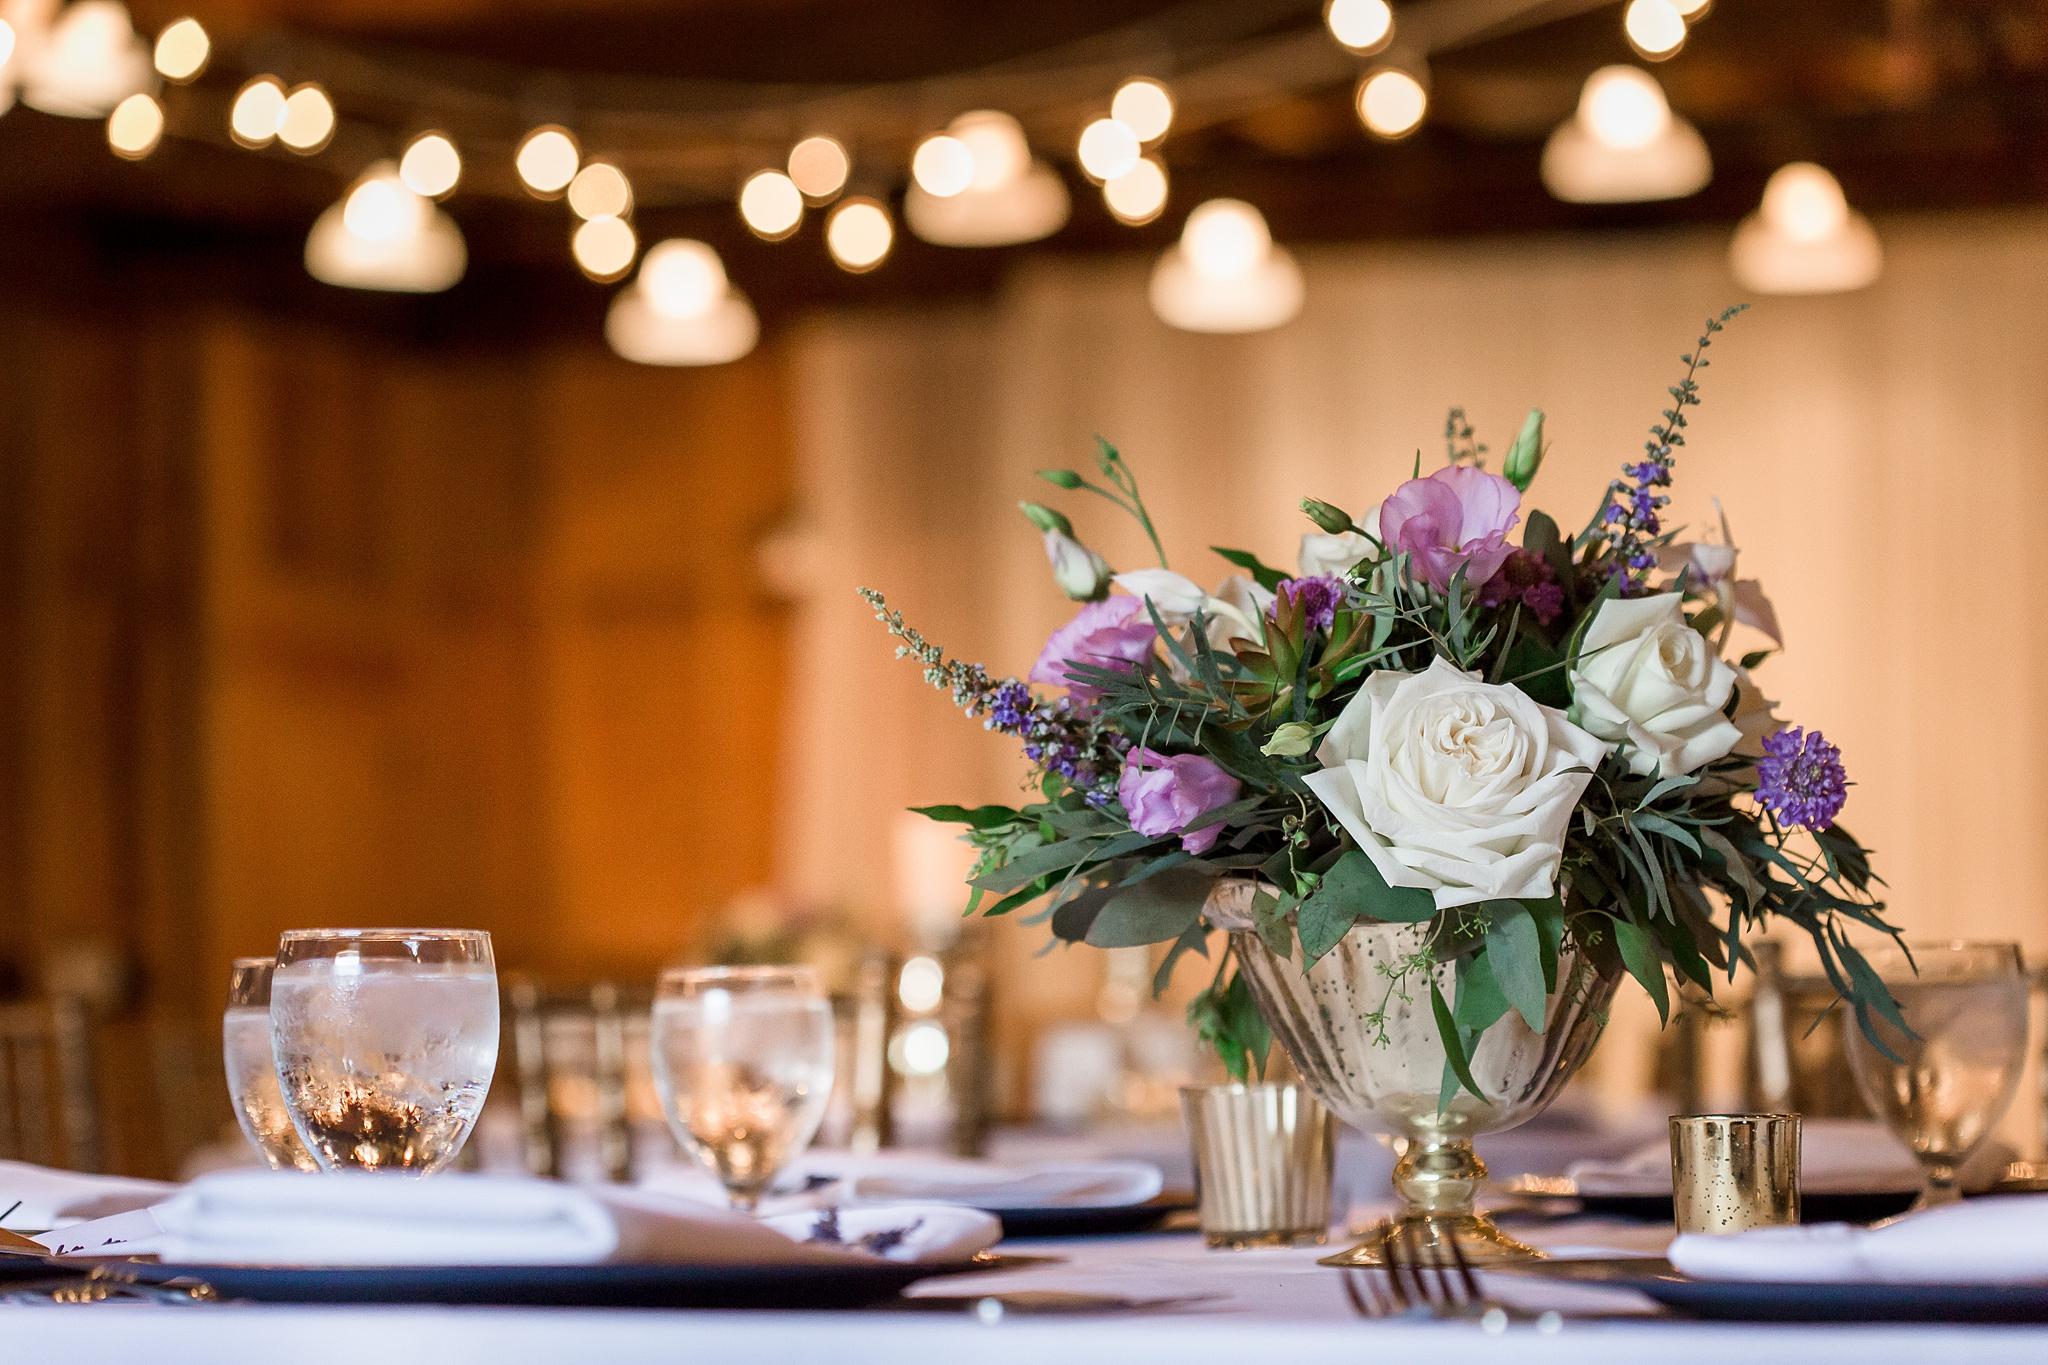 Tallahassee_wedding_planner.jpg